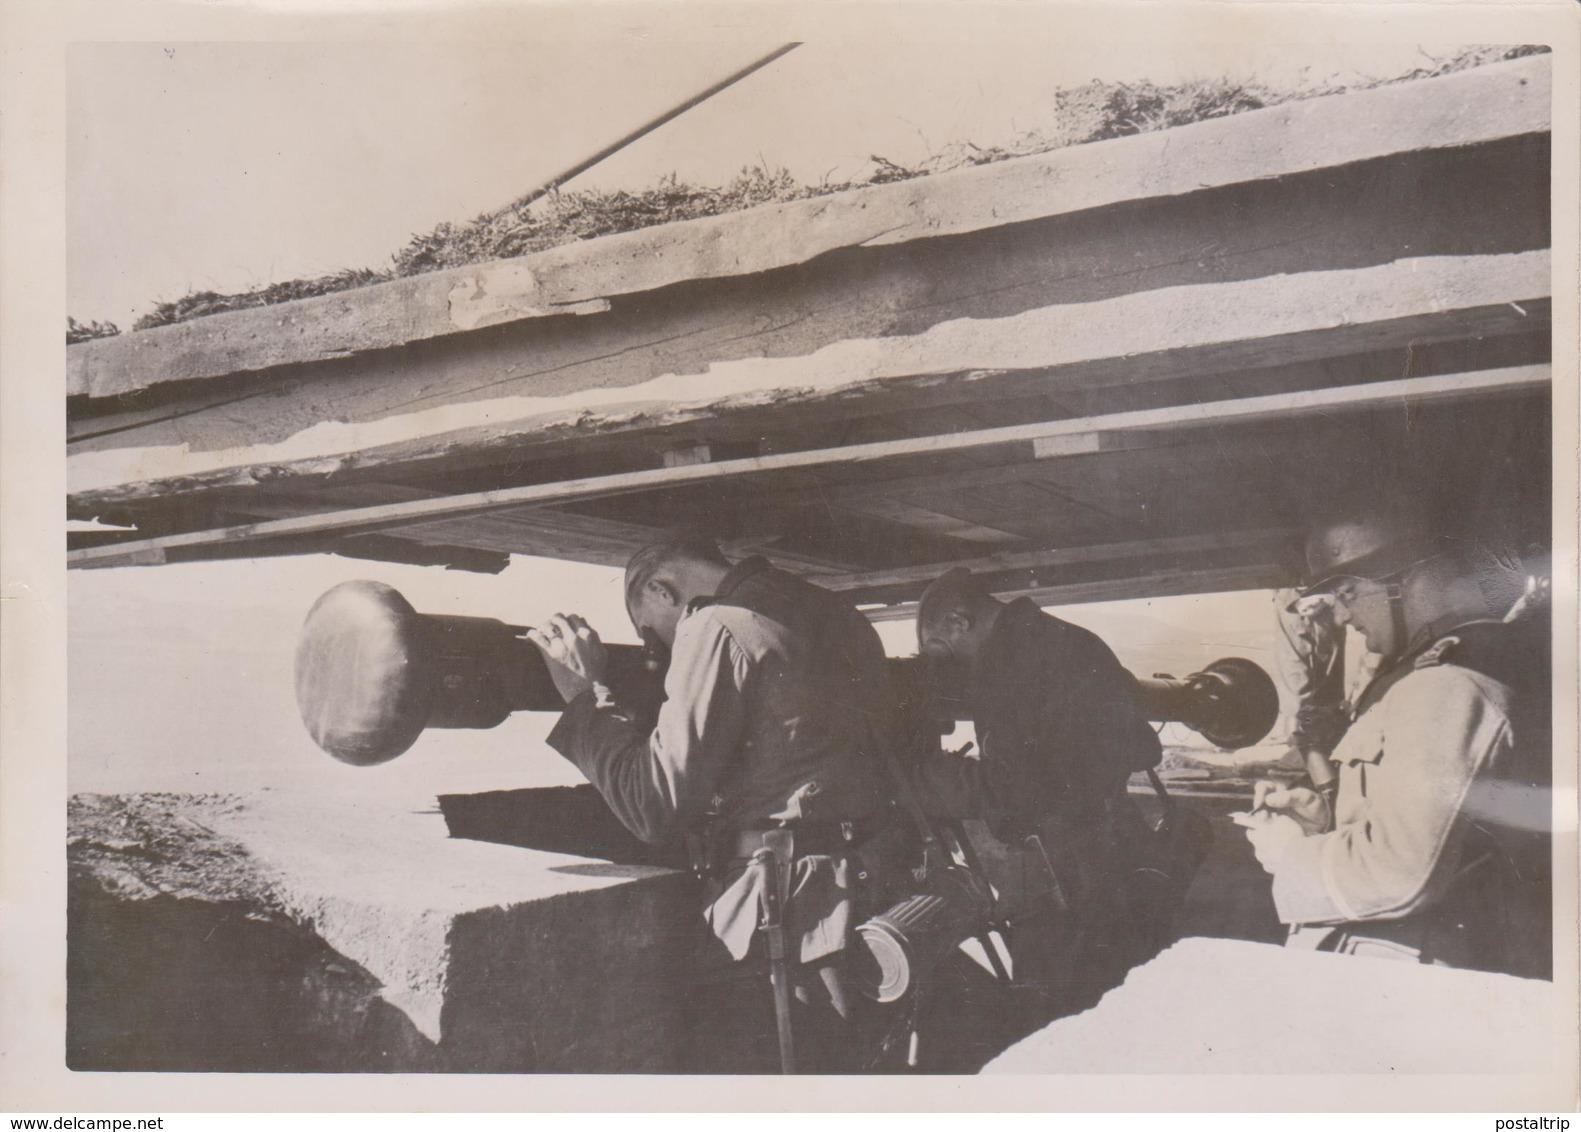 FJORDE E MESSER  NORWEGEN NORWAY FOTO DE PRESSE WW2 WWII WORLD WAR 2 WELTKRIEG Aleman Deutchland - Guerra, Militares